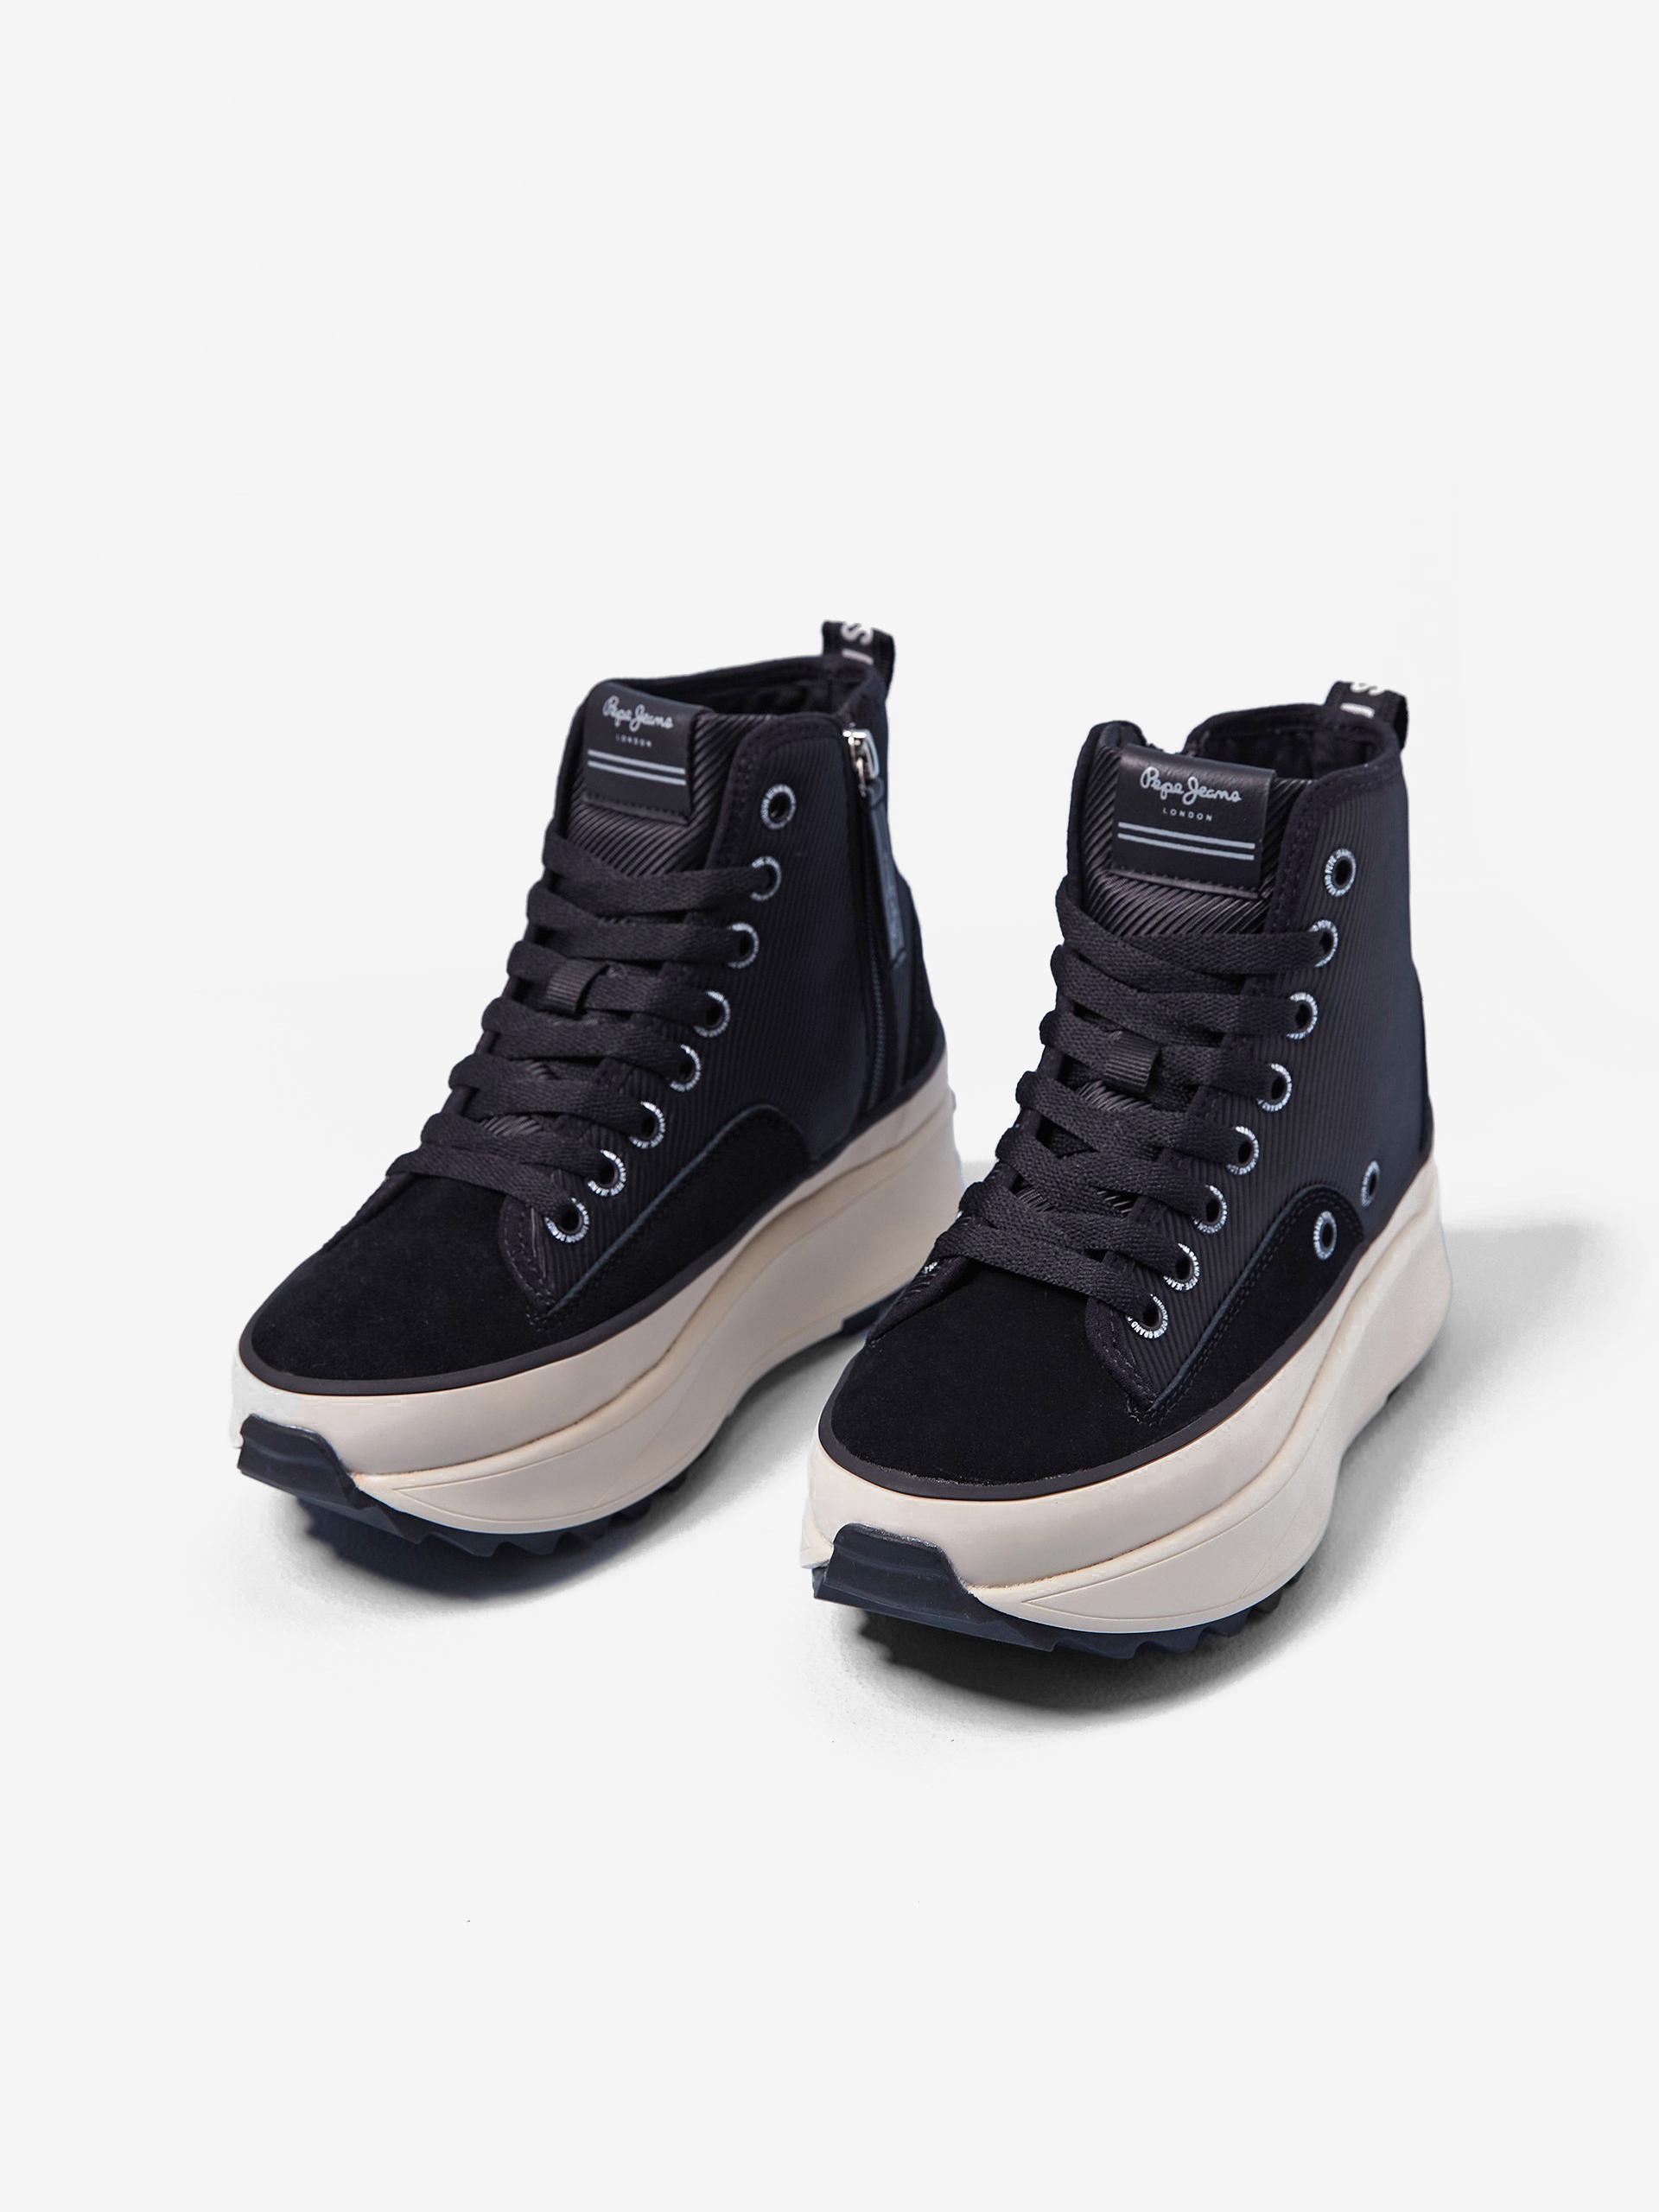 Čierne členkové topánky na platforme Pepe Jeans Woking - 36